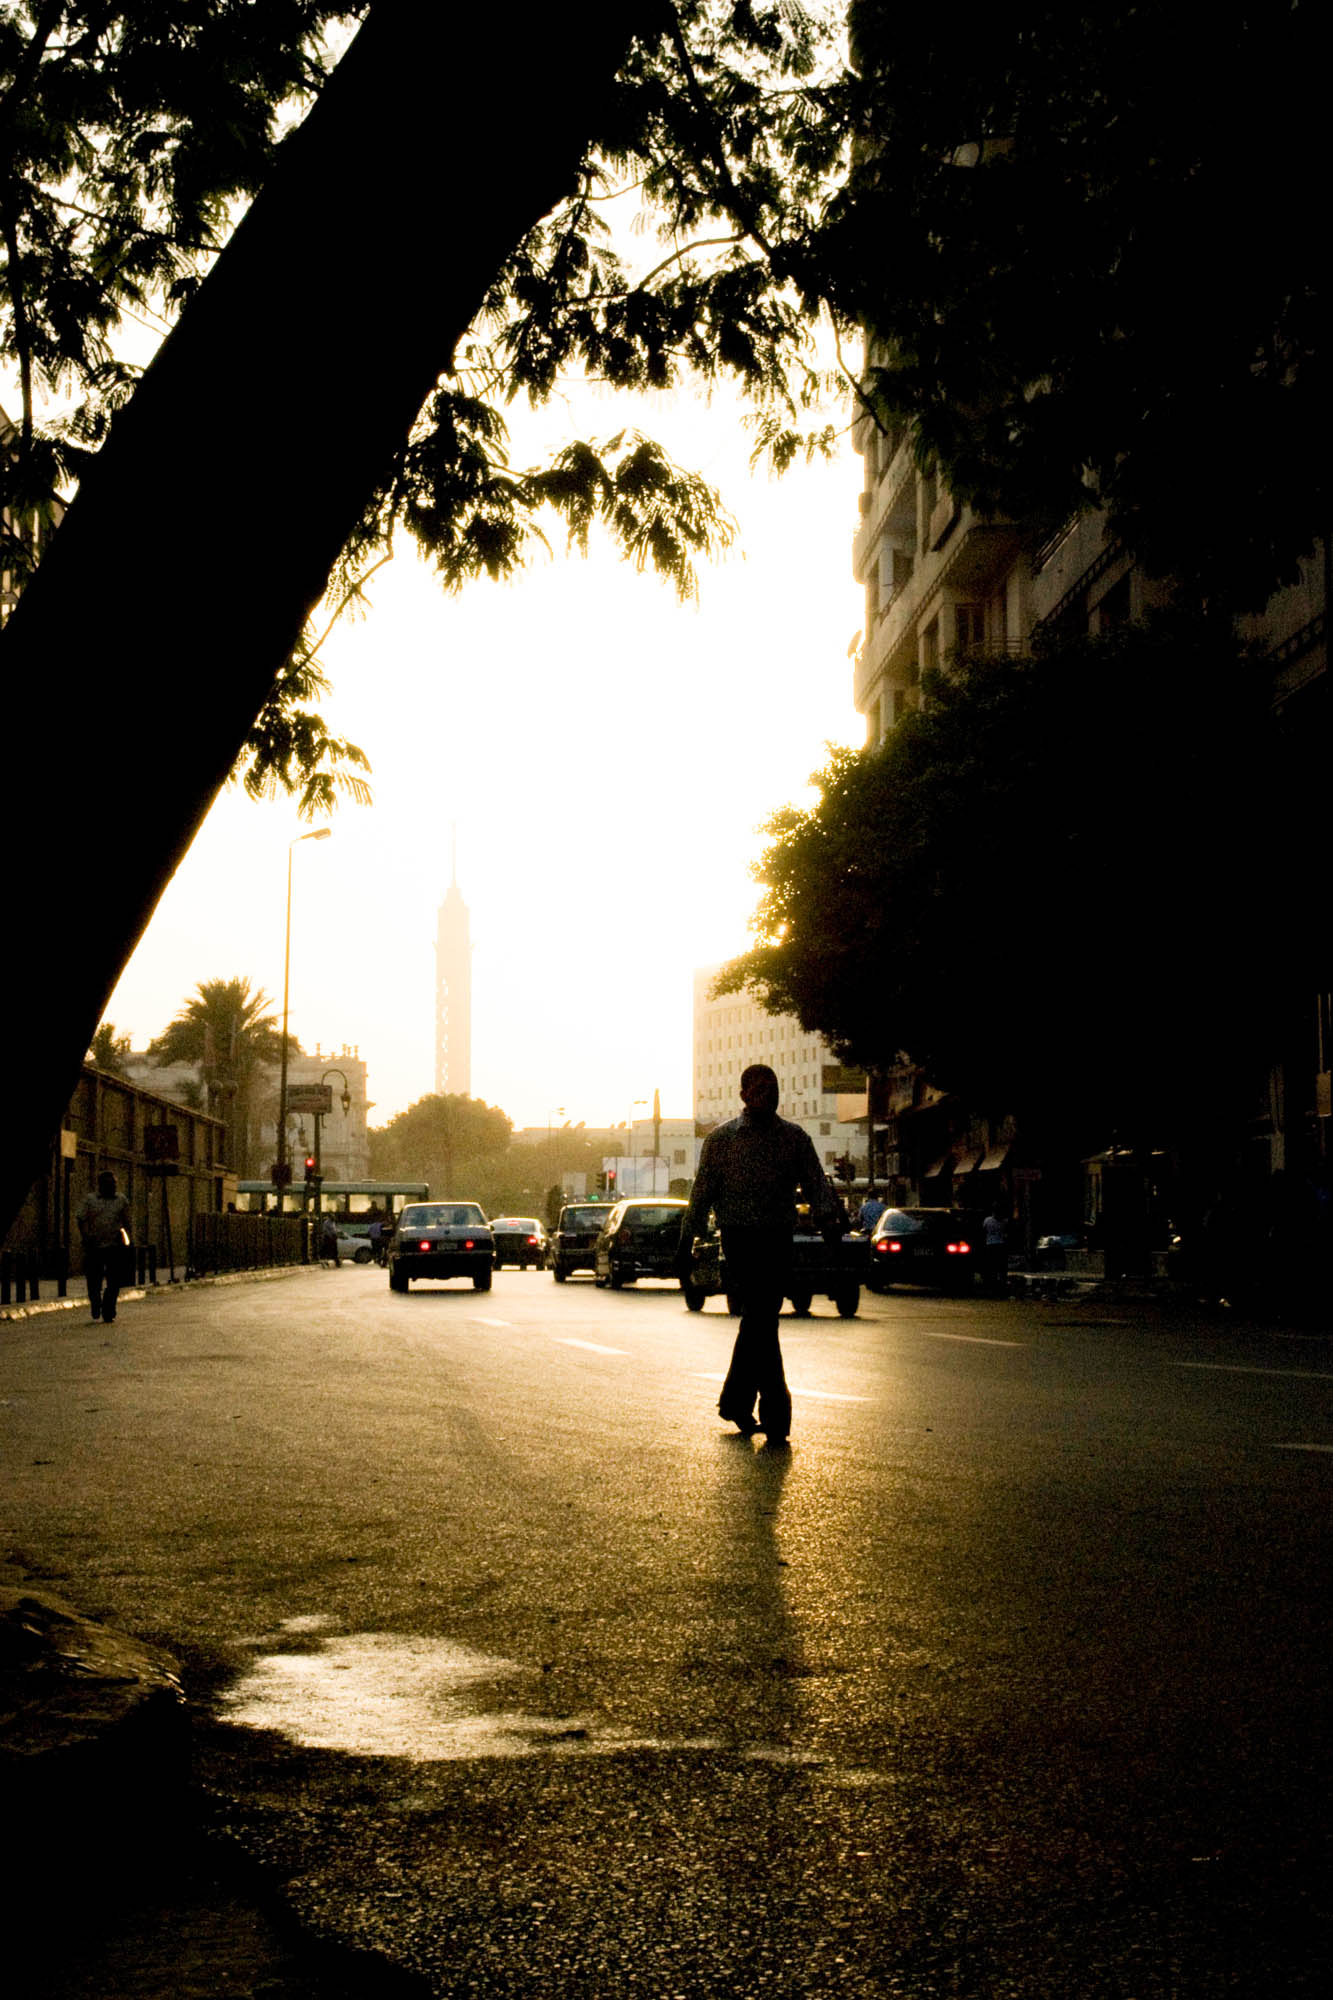 a man walks through Tahrir Square in Cairo, Egypt around dusk